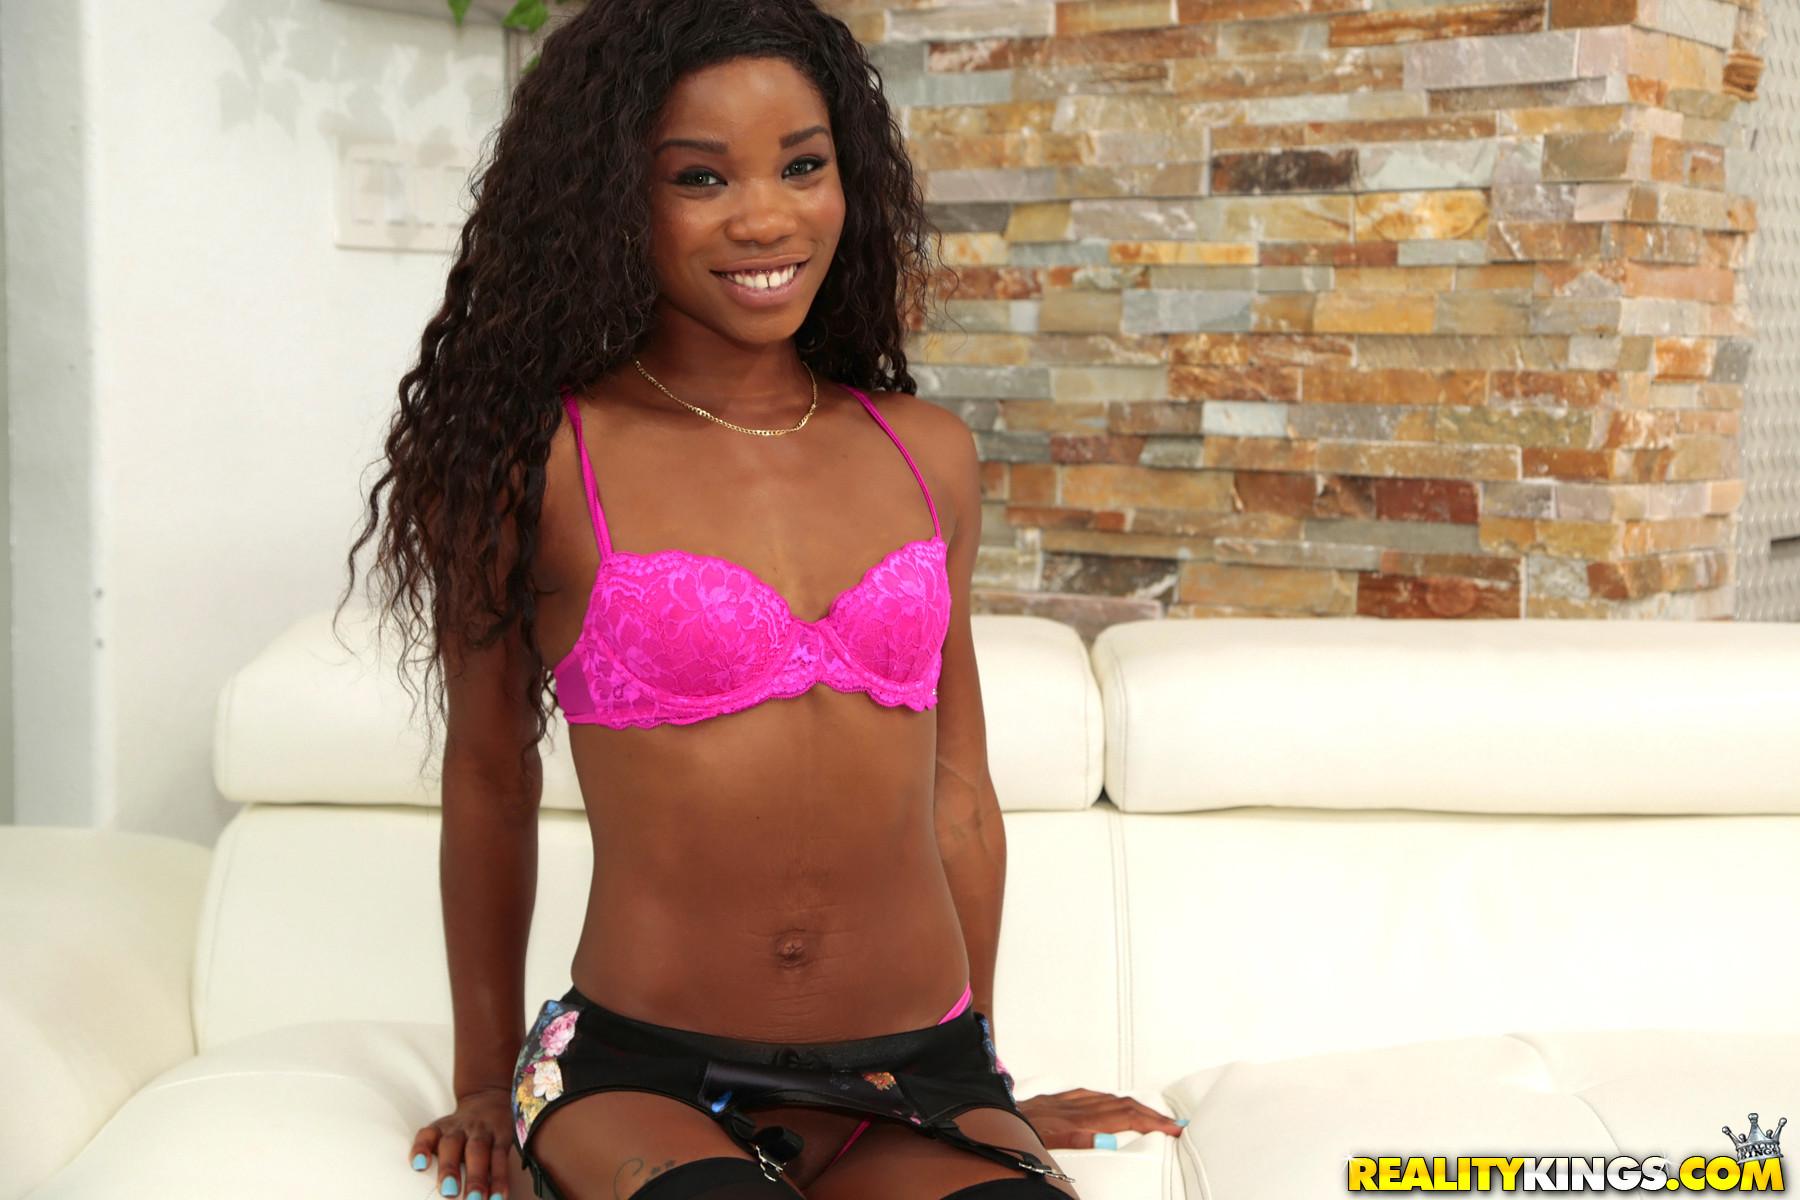 Curvy black girl enjoys a white dick in her ebony booty